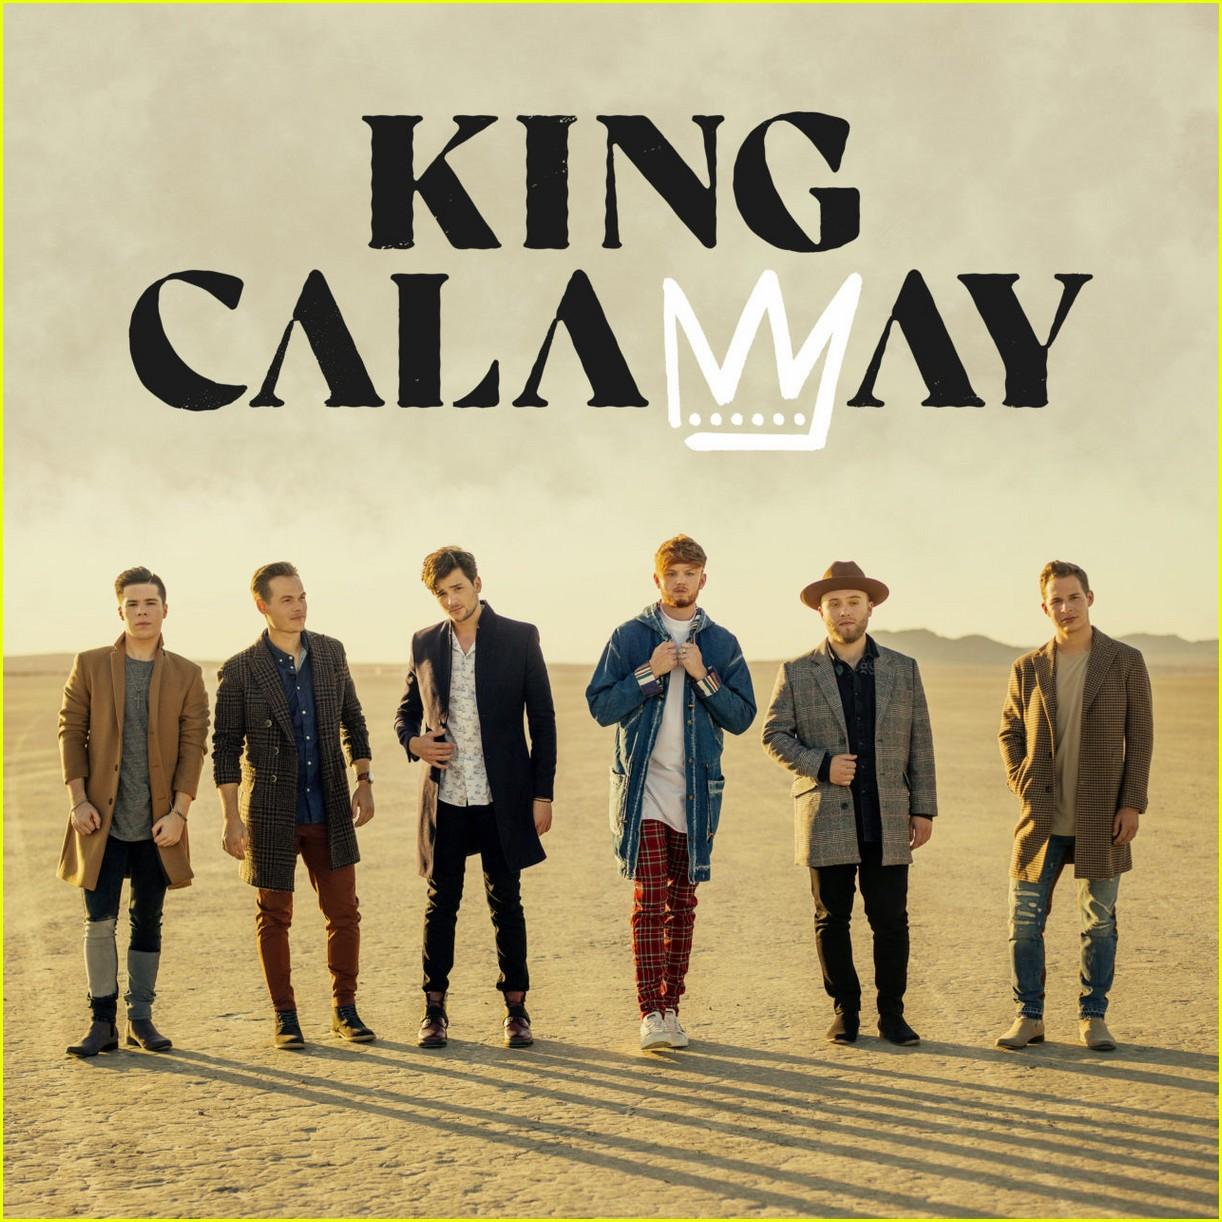 king calaway 10 fun facts 034255303